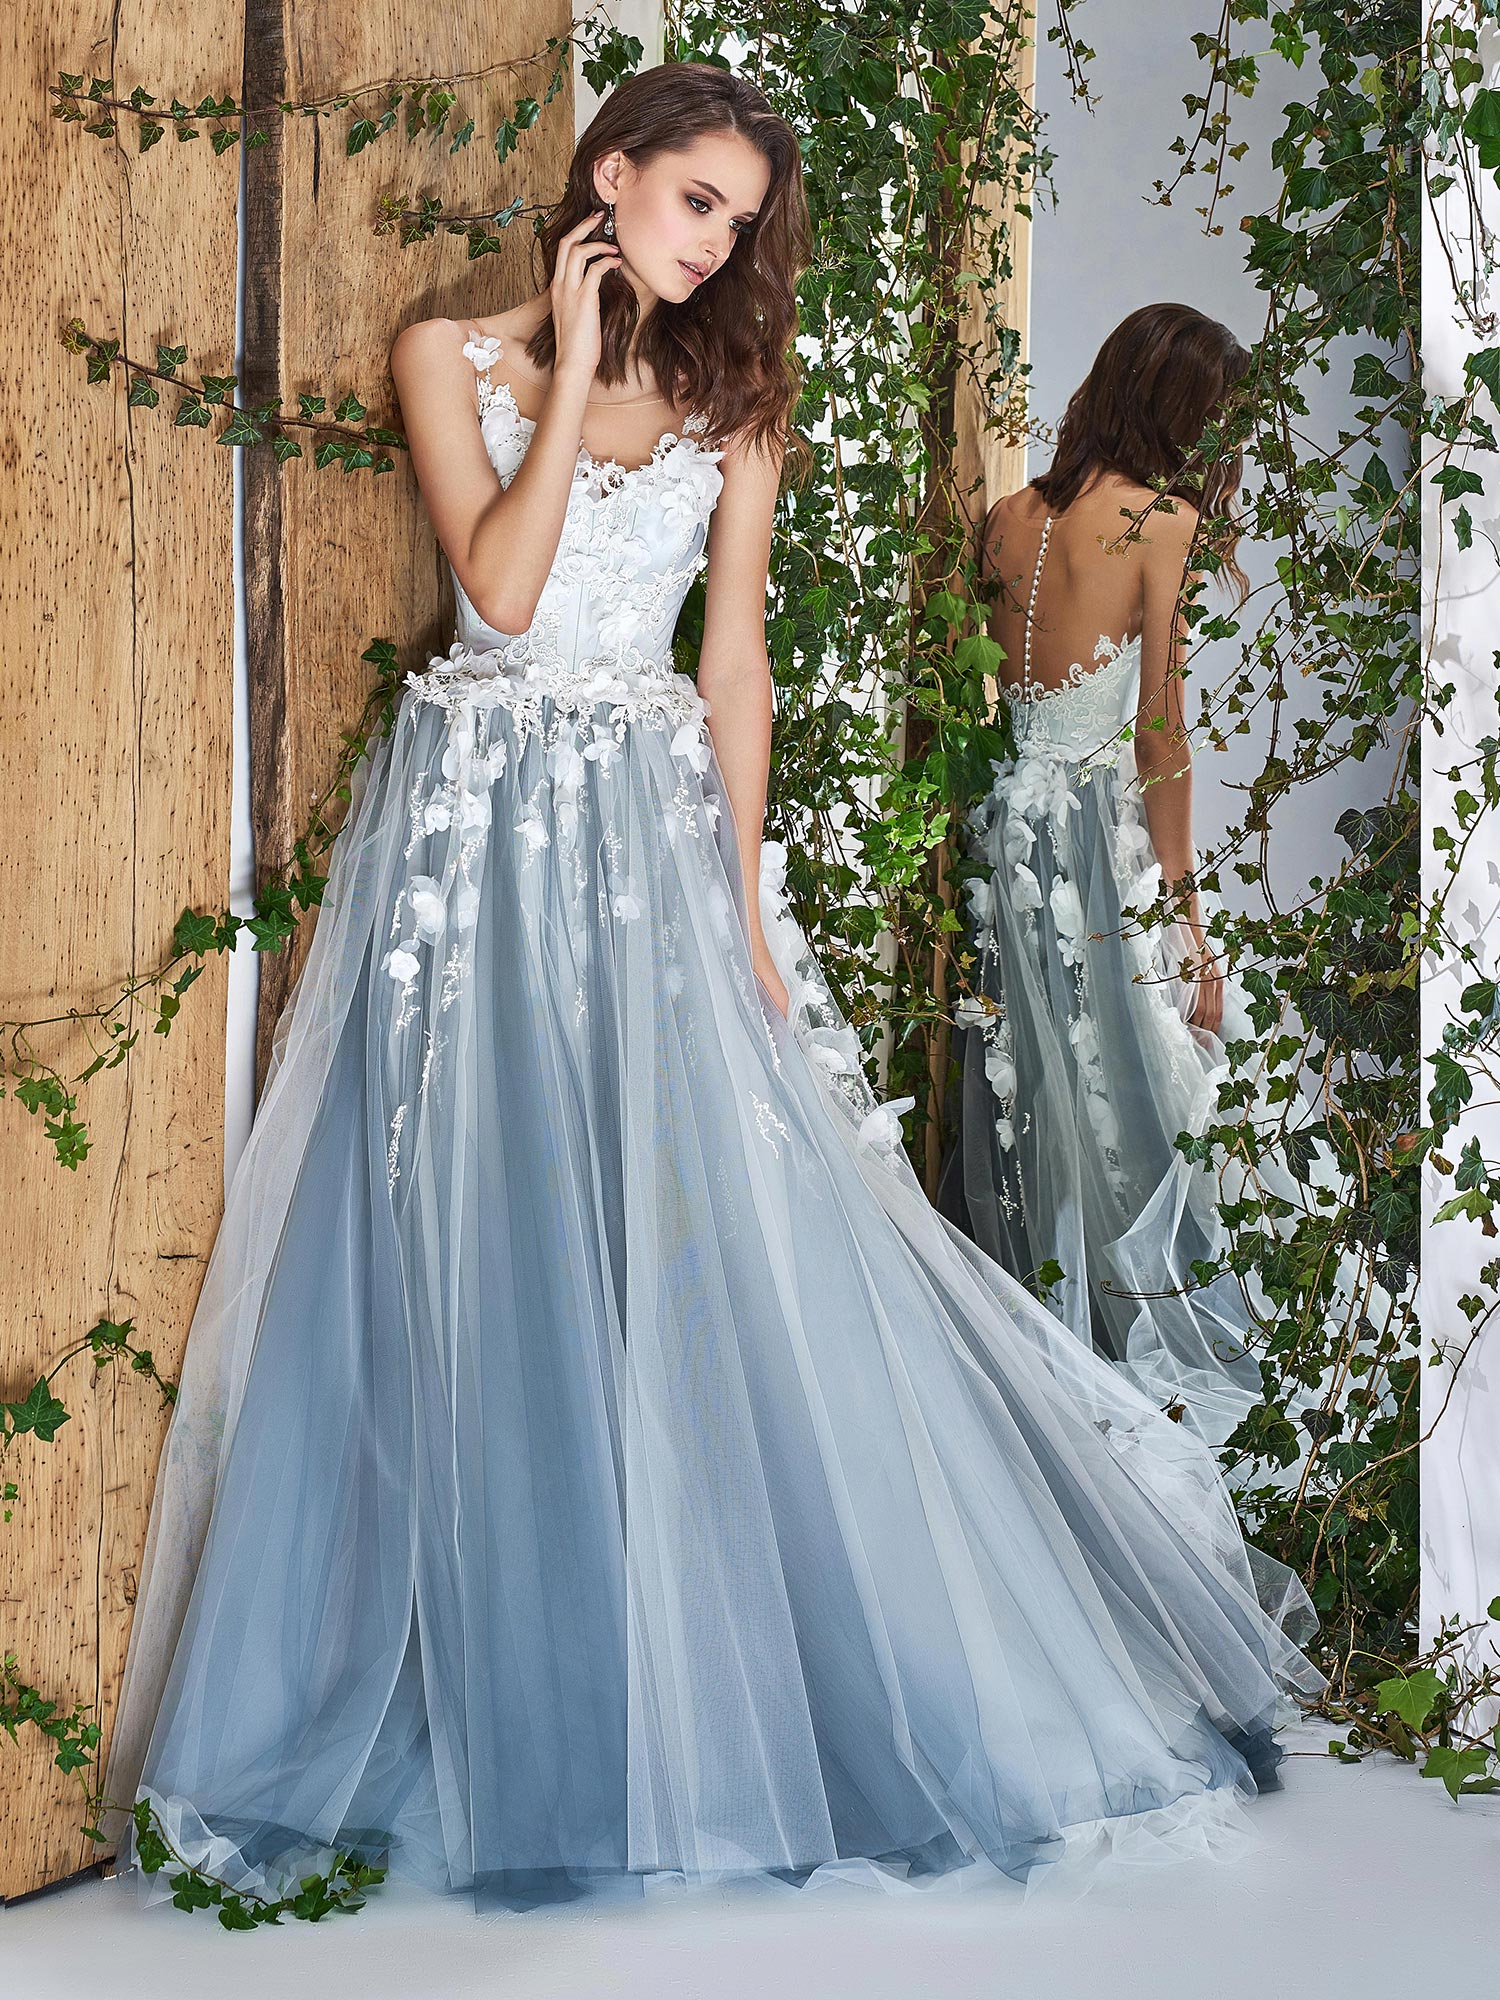 Famous Wedding Dress Illusion Neckline Frieze - All Wedding Dresses ...